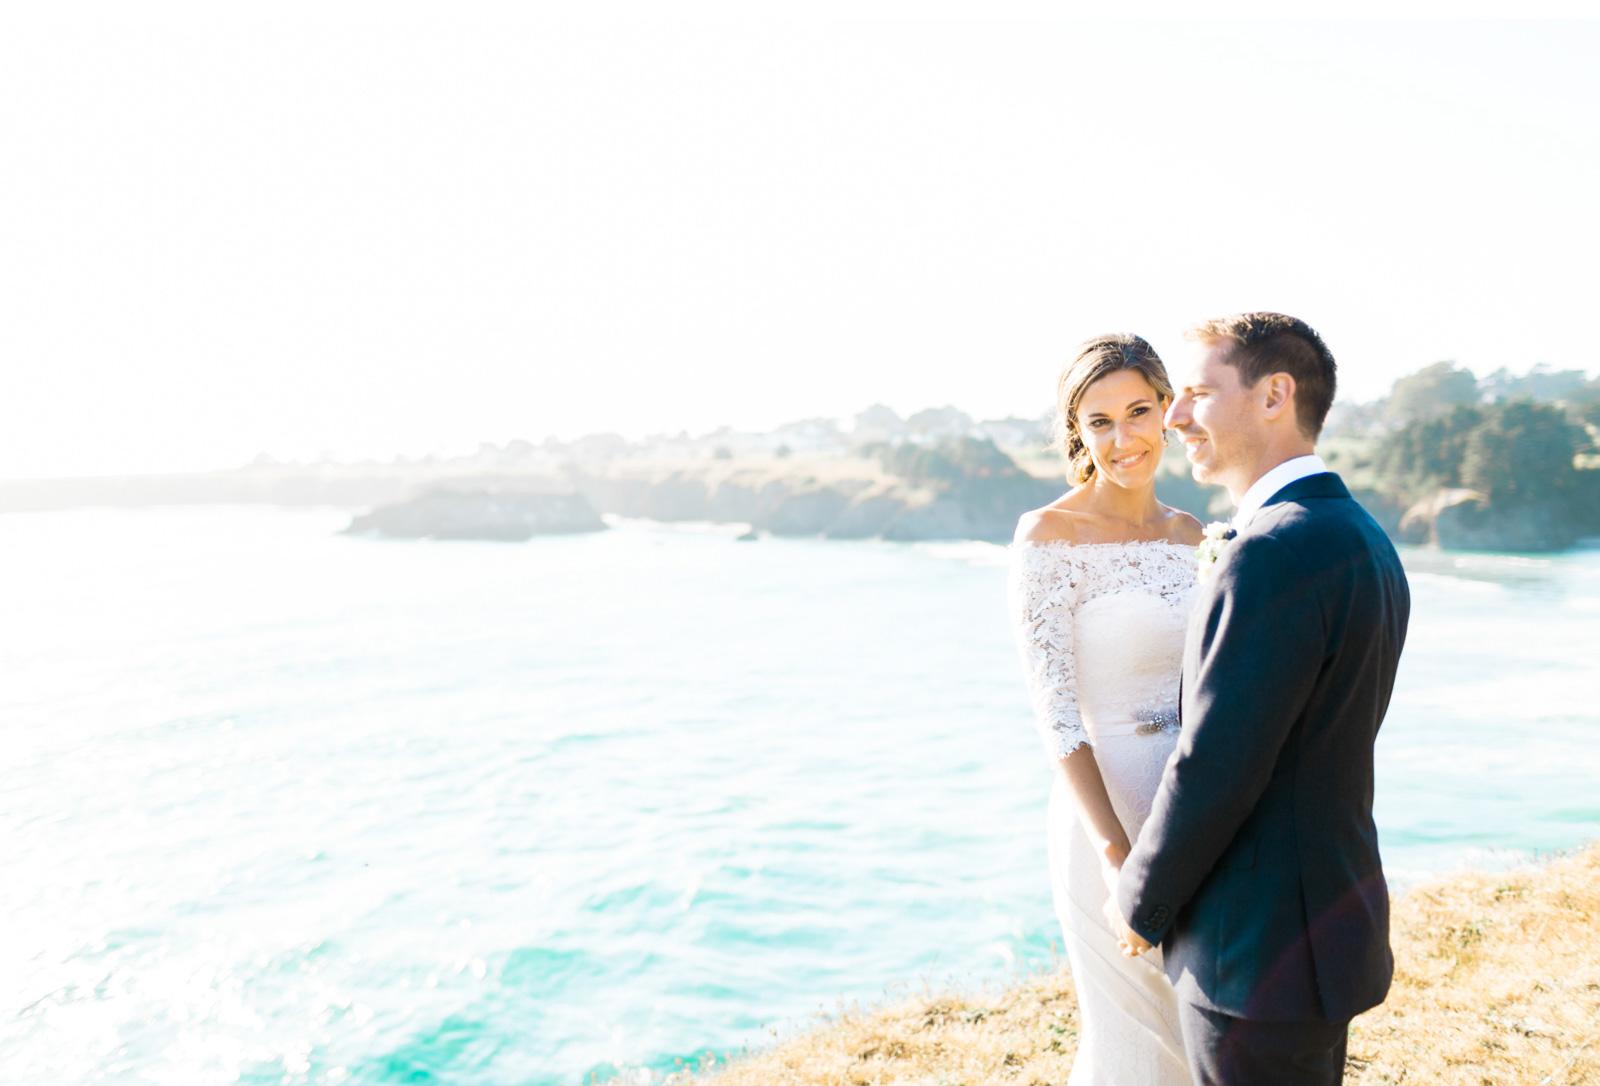 Style-Me-Pretty-Mendocino-Wedding-Natalie-Schutt-Photography_15.jpg